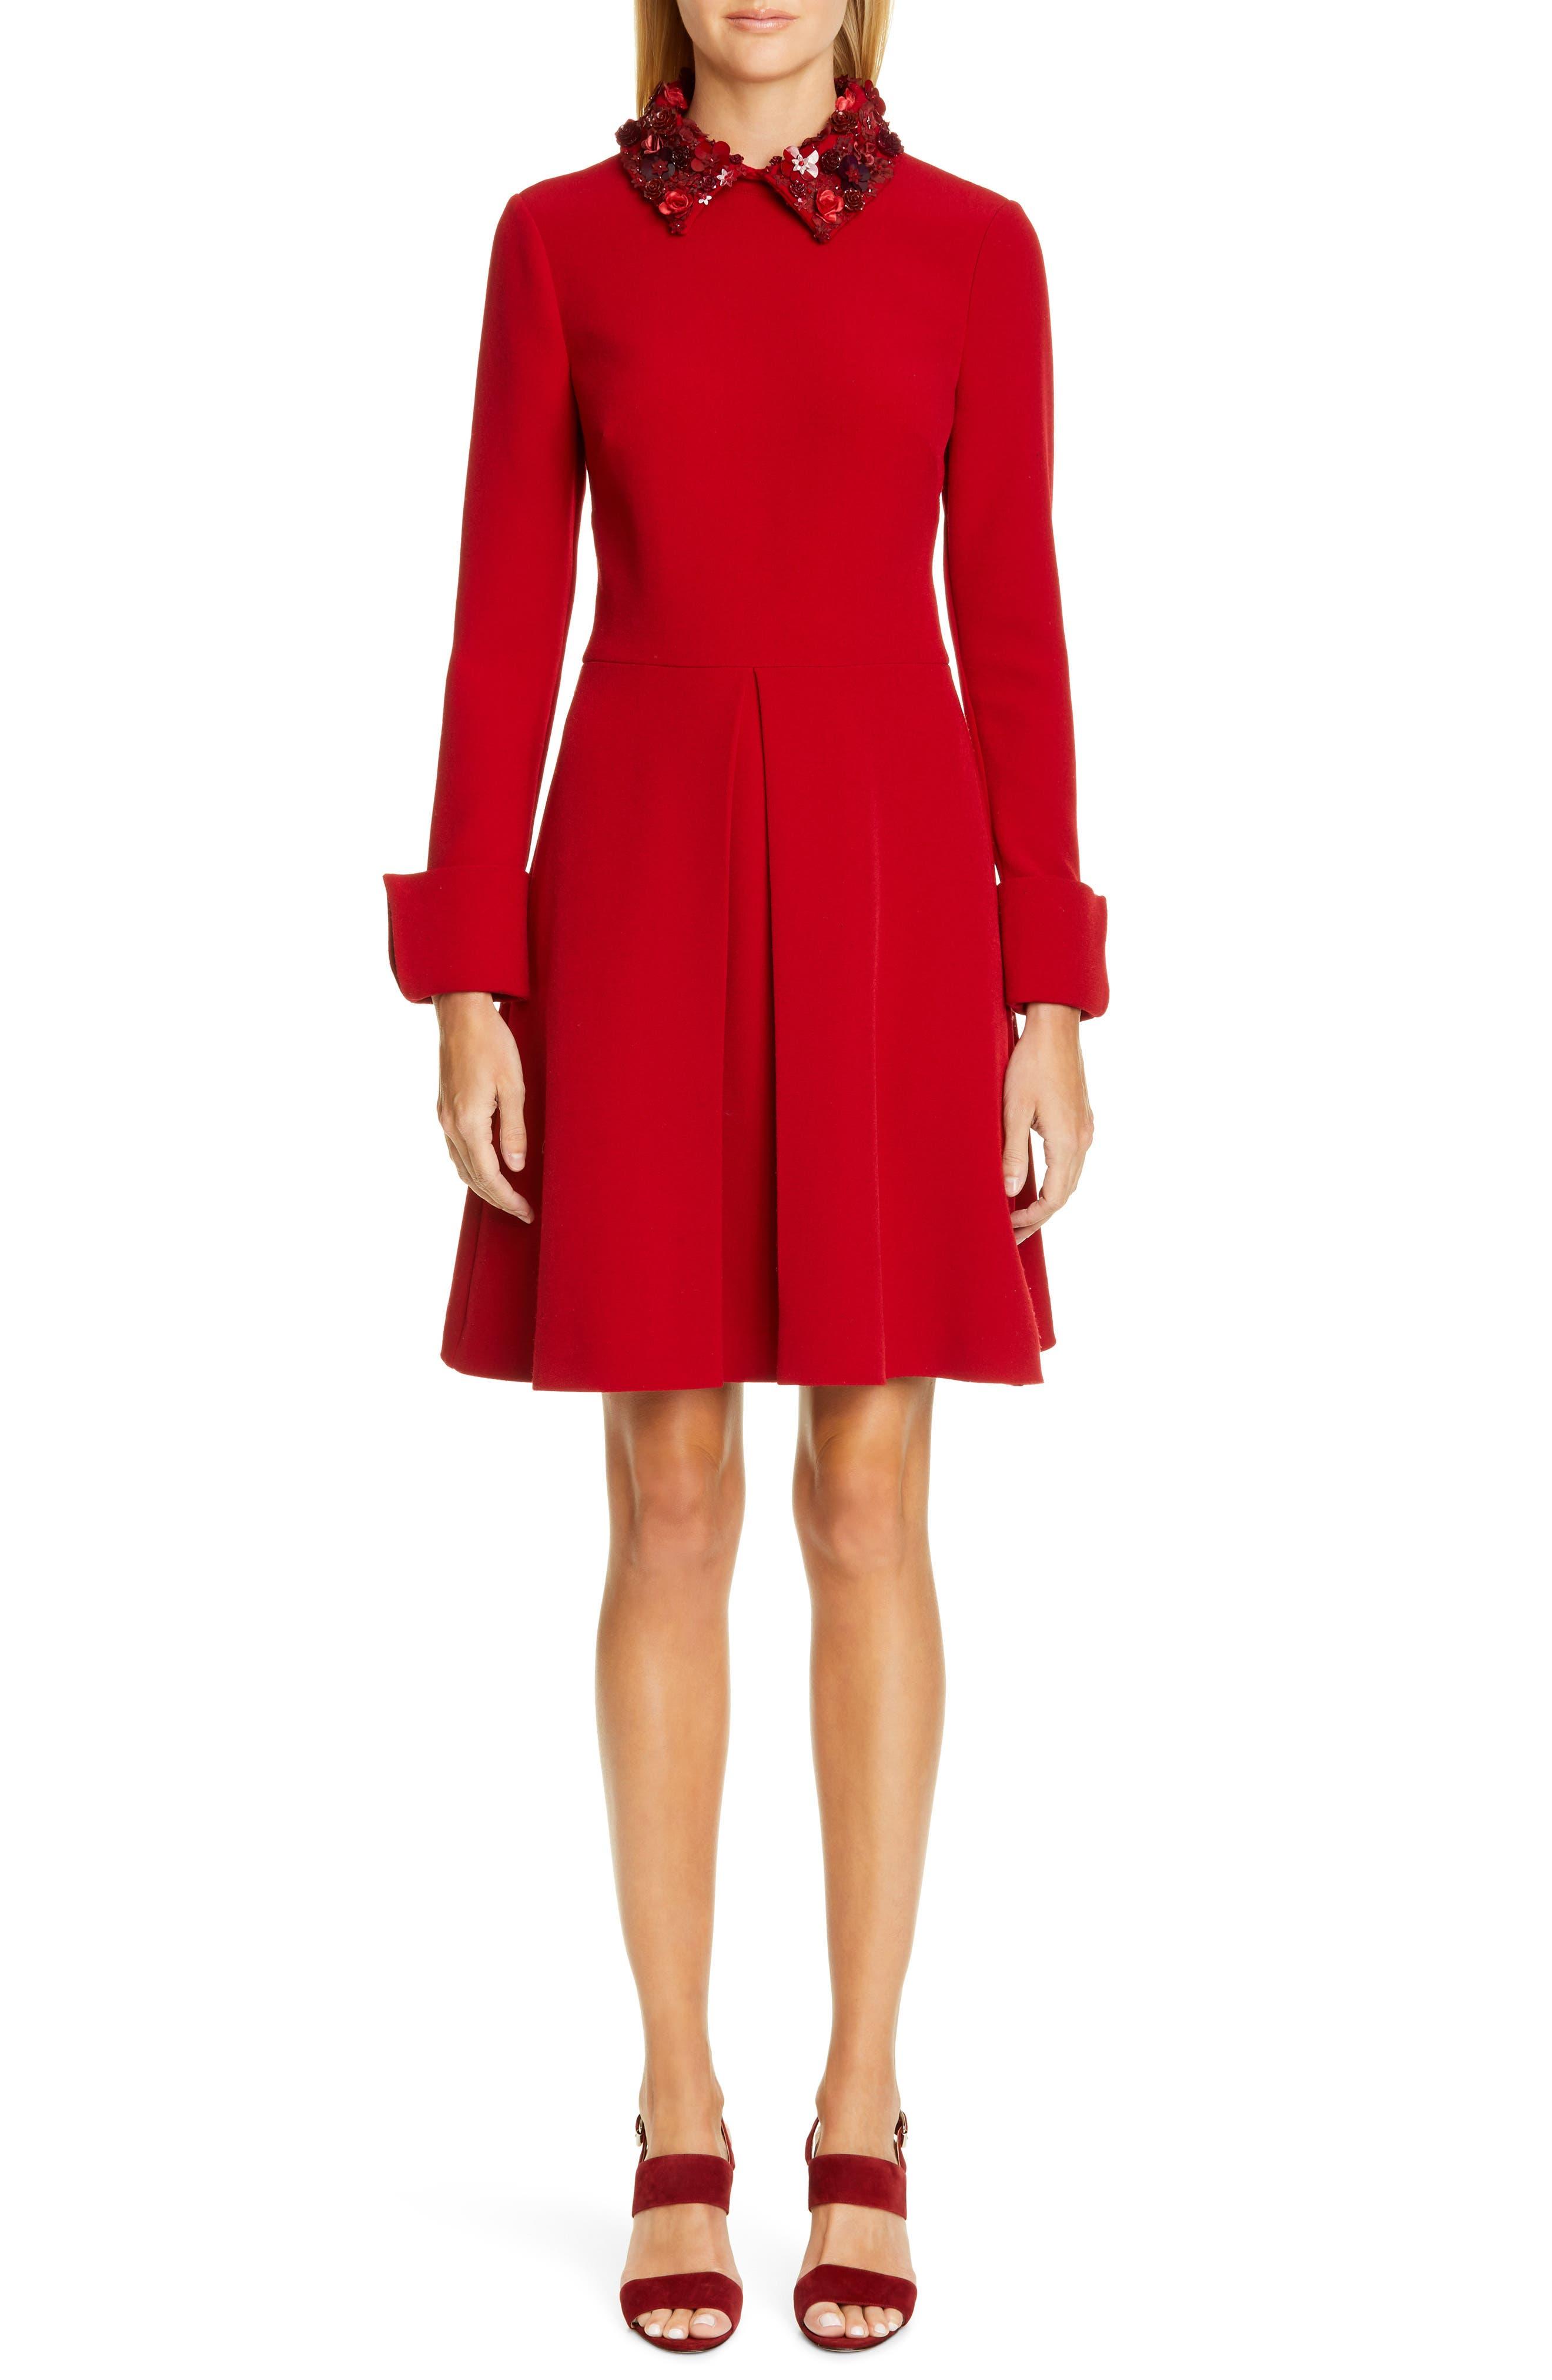 Badgley Mischka Embellished Collar Long Sleeve Cocktail Dress, Red